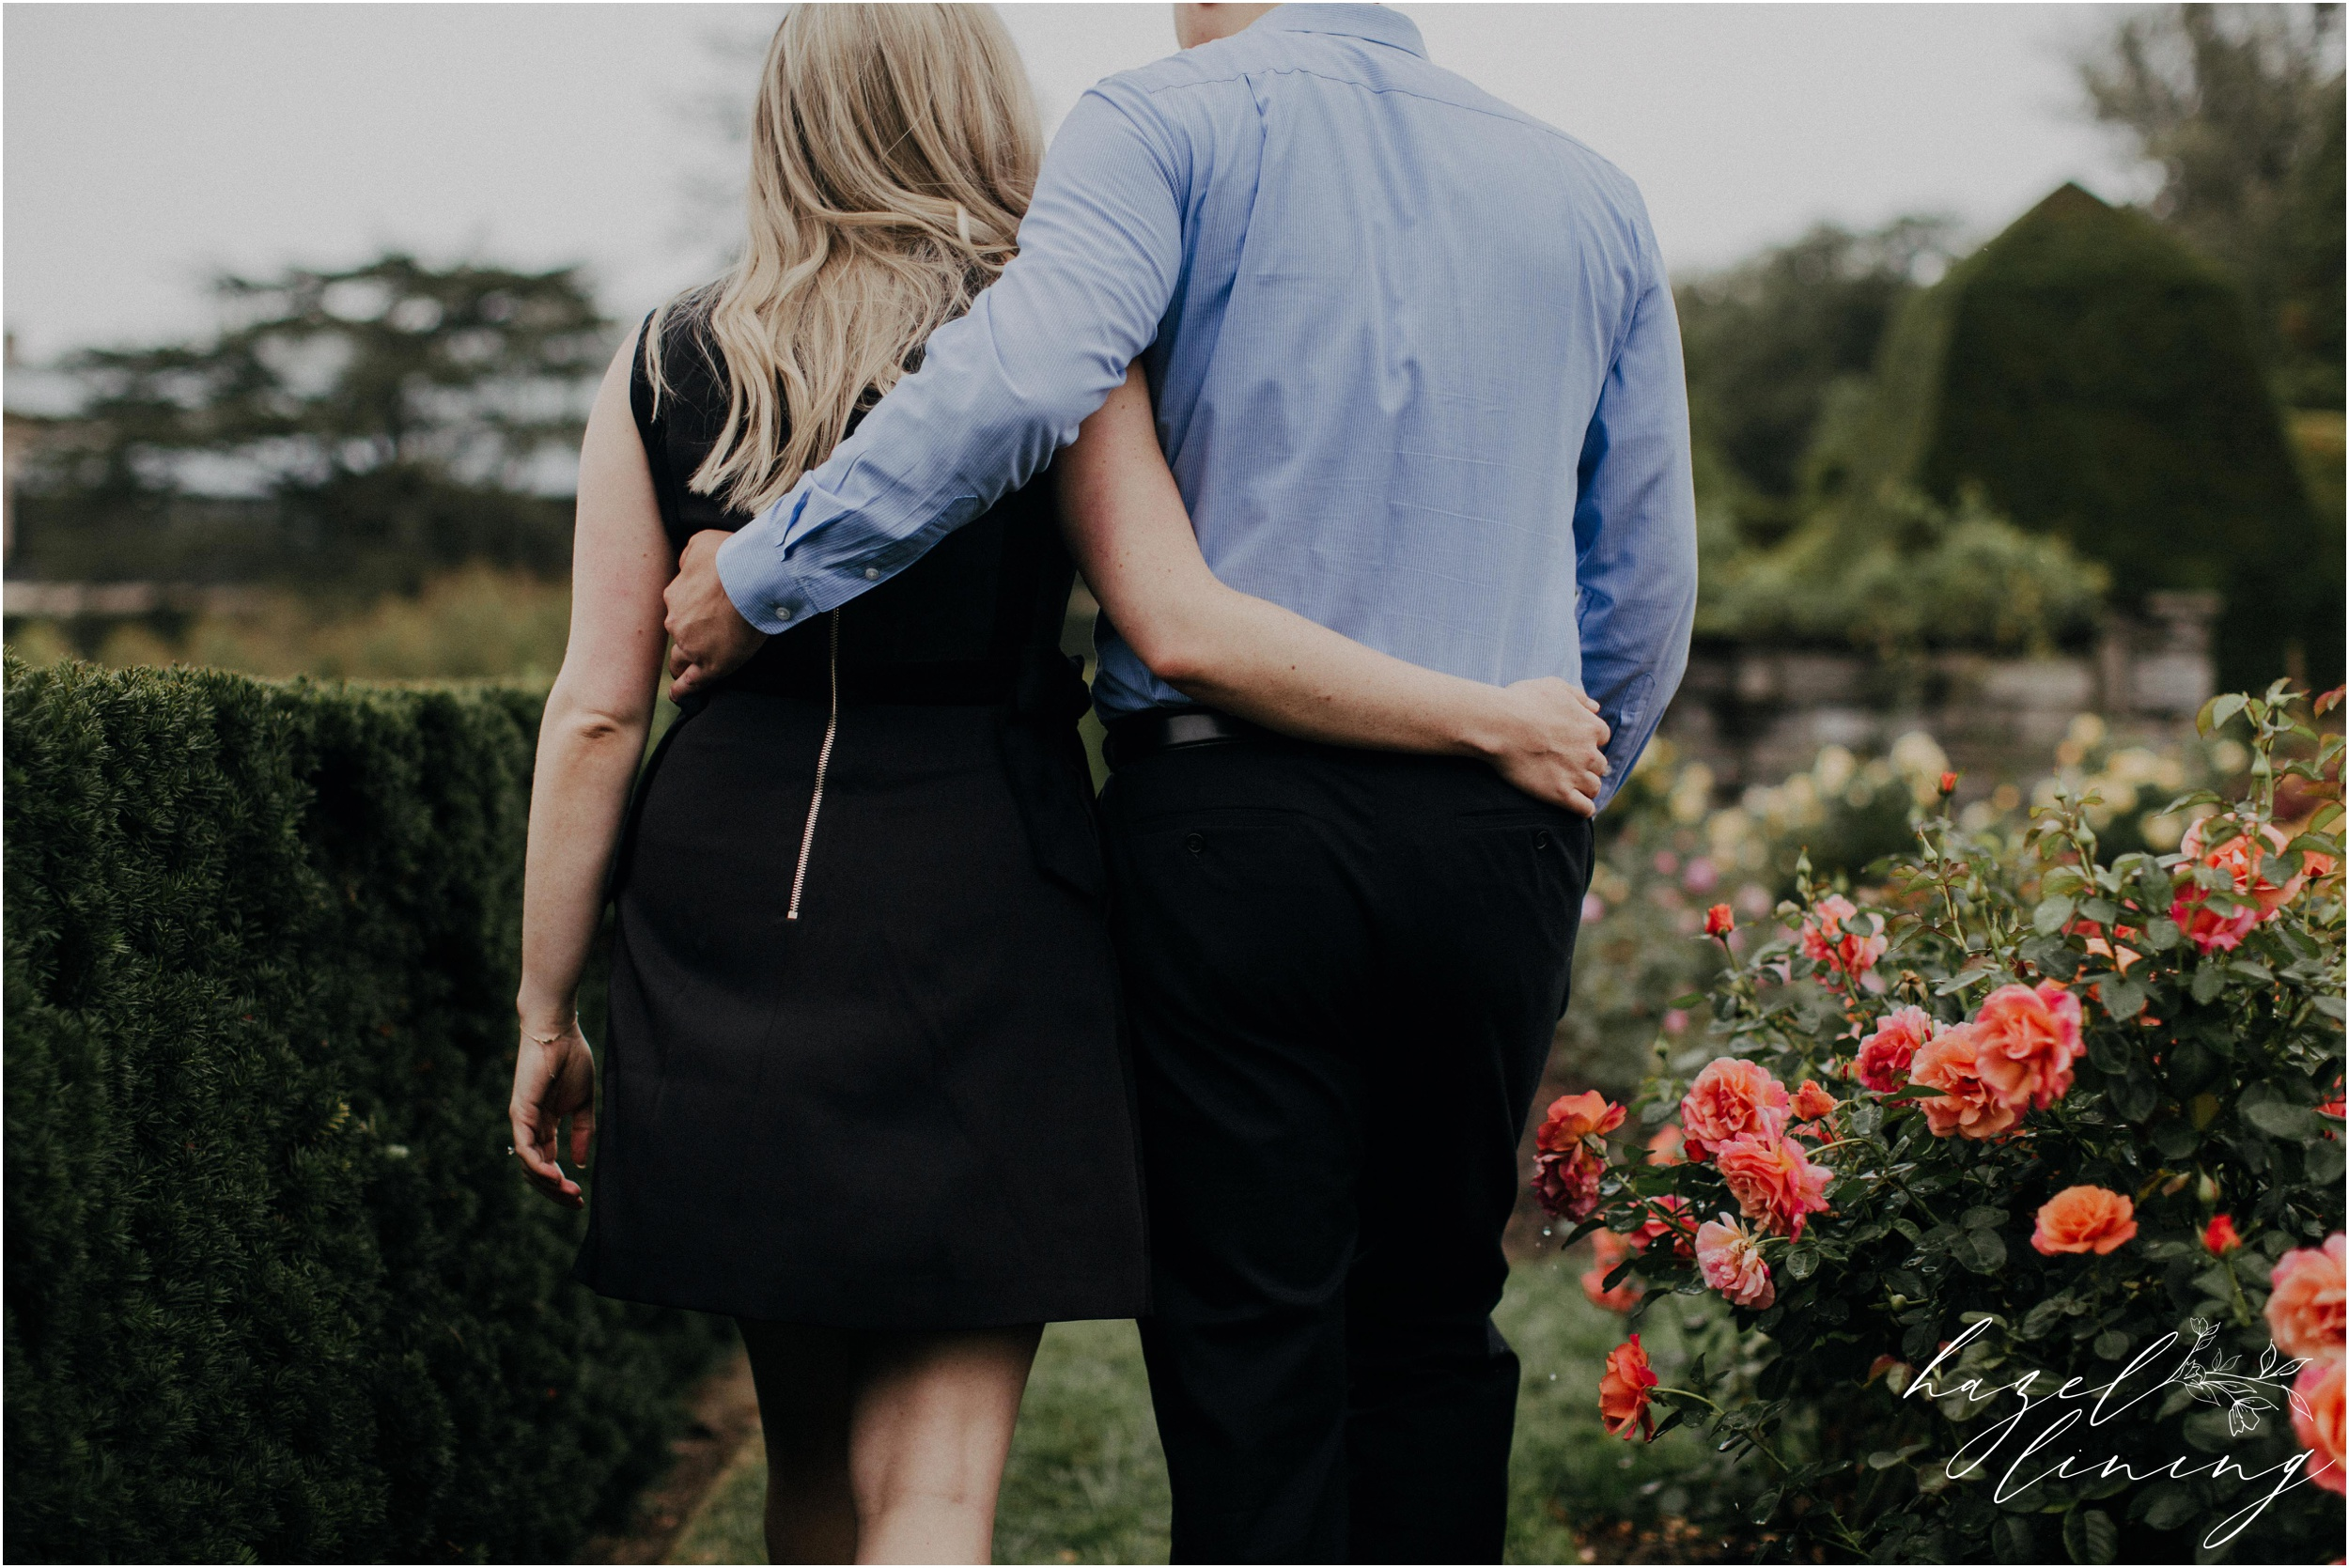 victoria-travis-logan-mayes-longwood-gardens-kennett-square-philadelphia-engagement-session-hazel-lining-photography-destination-elopement-wedding-engagement-photography_0011.jpg